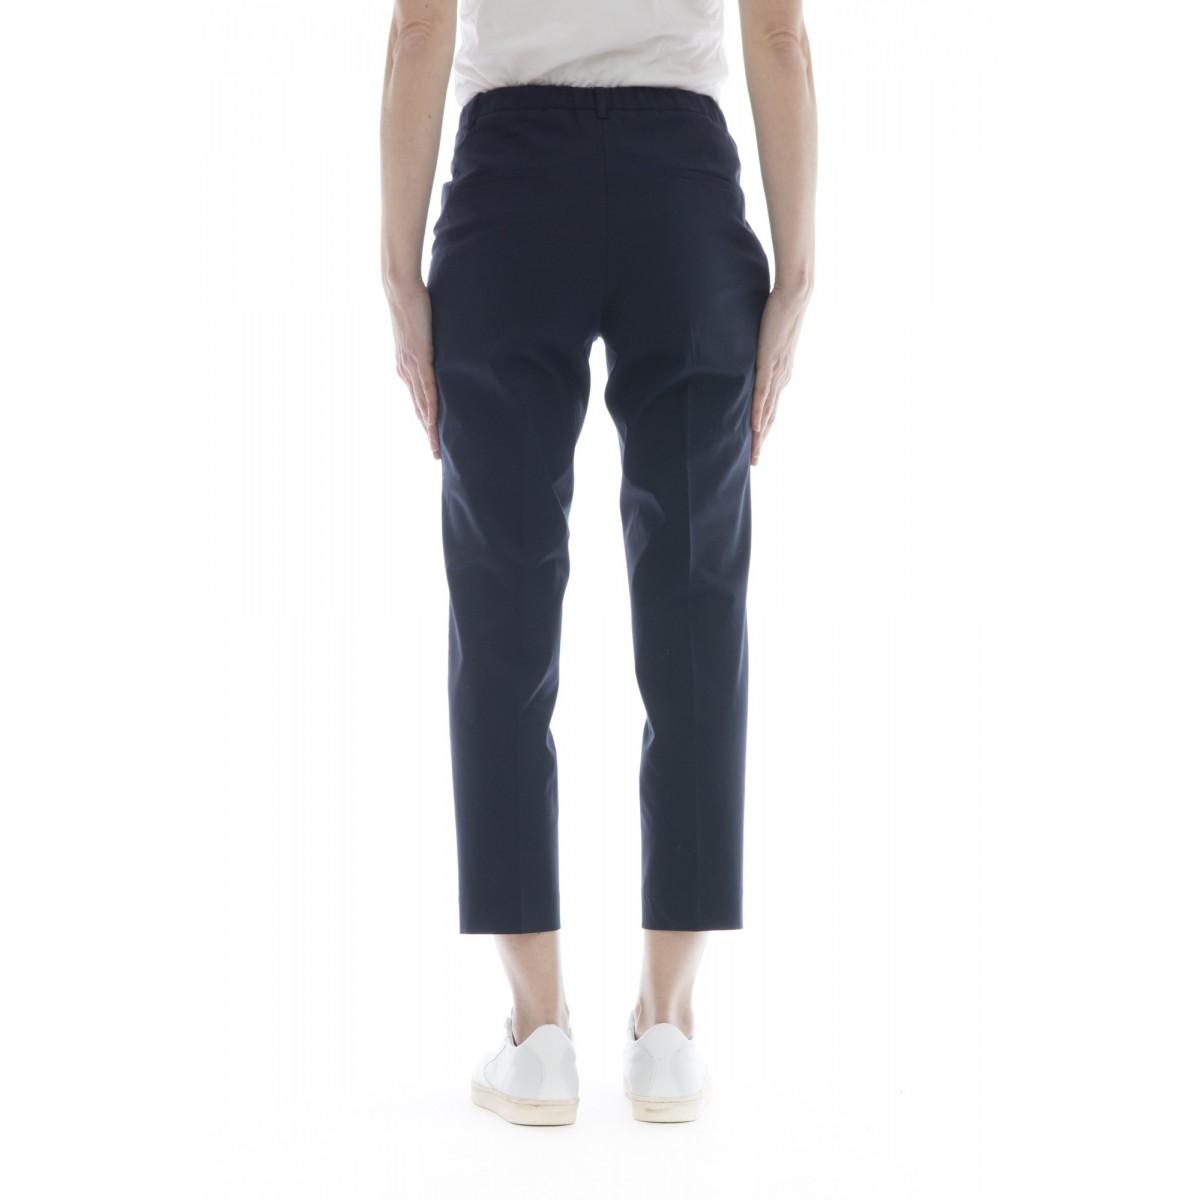 Pantalone donna - Galene 171659 d6202